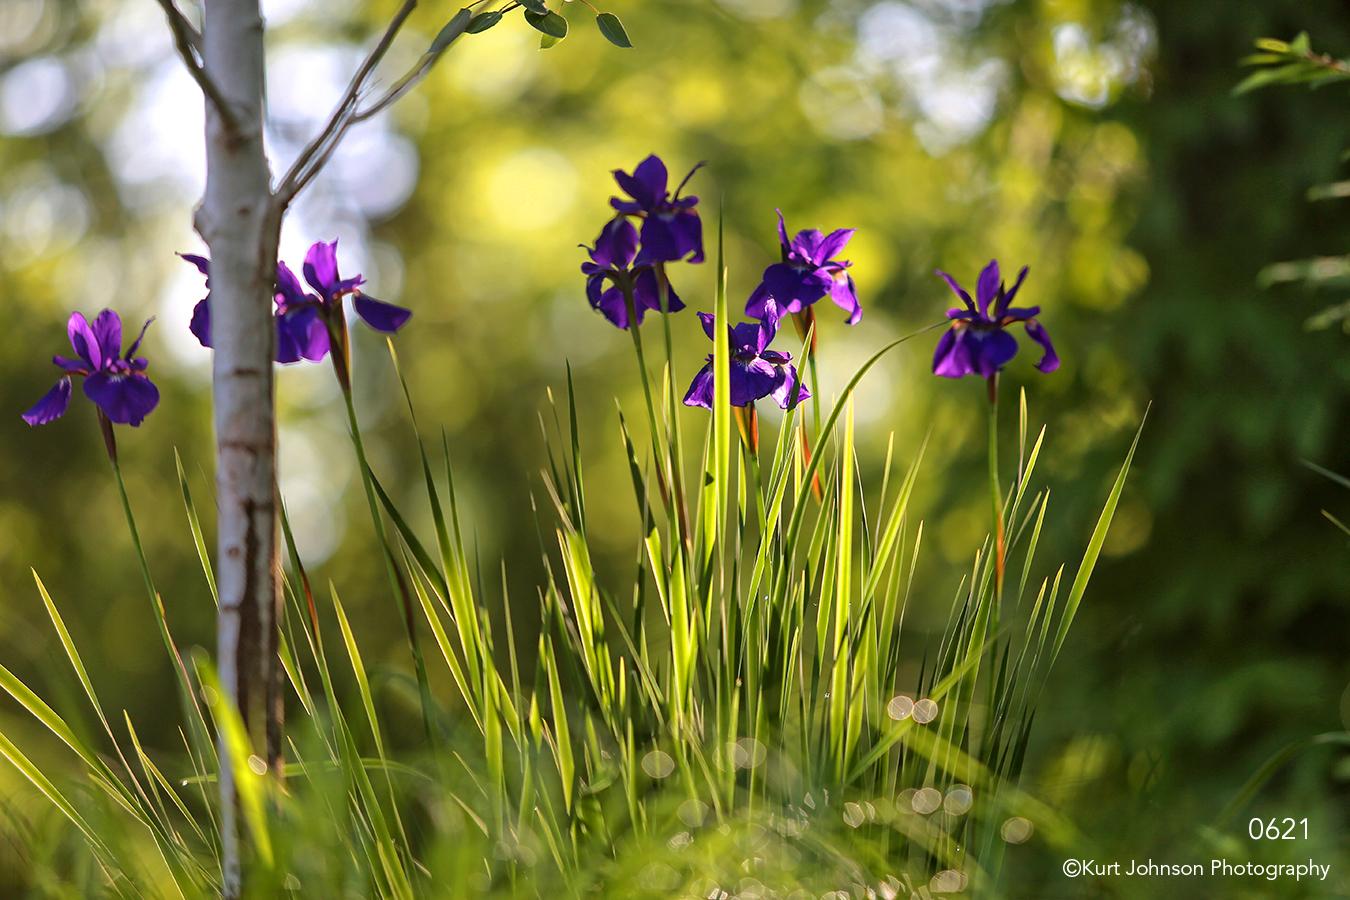 flowers grasses green iris purple forest trees